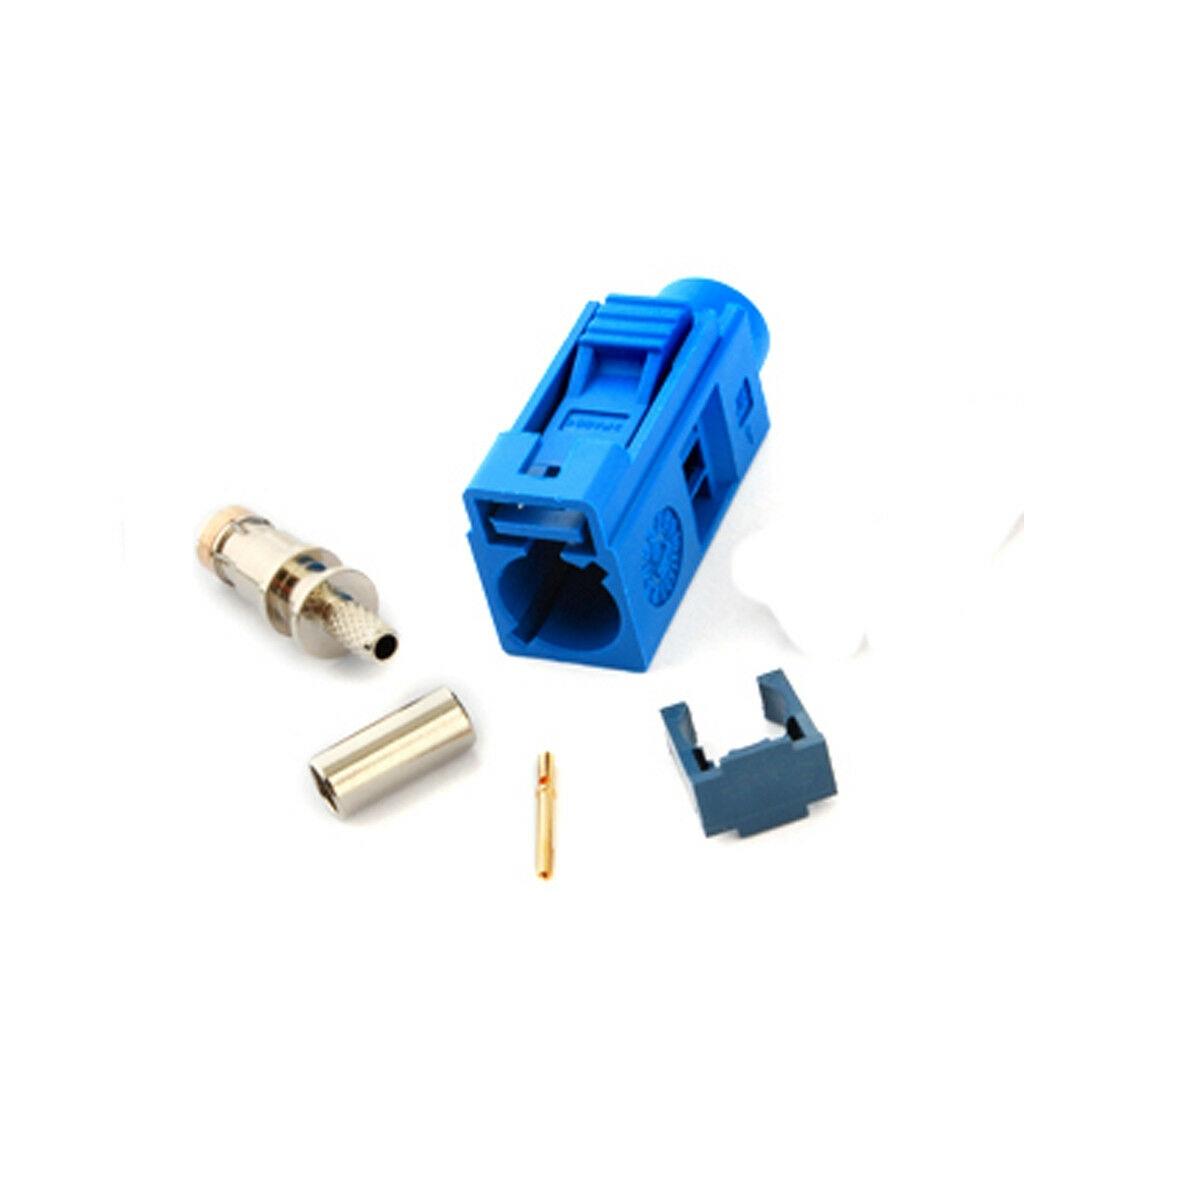 Conector Jack hembra YiNiTone Fakra C Azul/5005 engarzado para Cable RG316 para antena GPS telemática y navegación